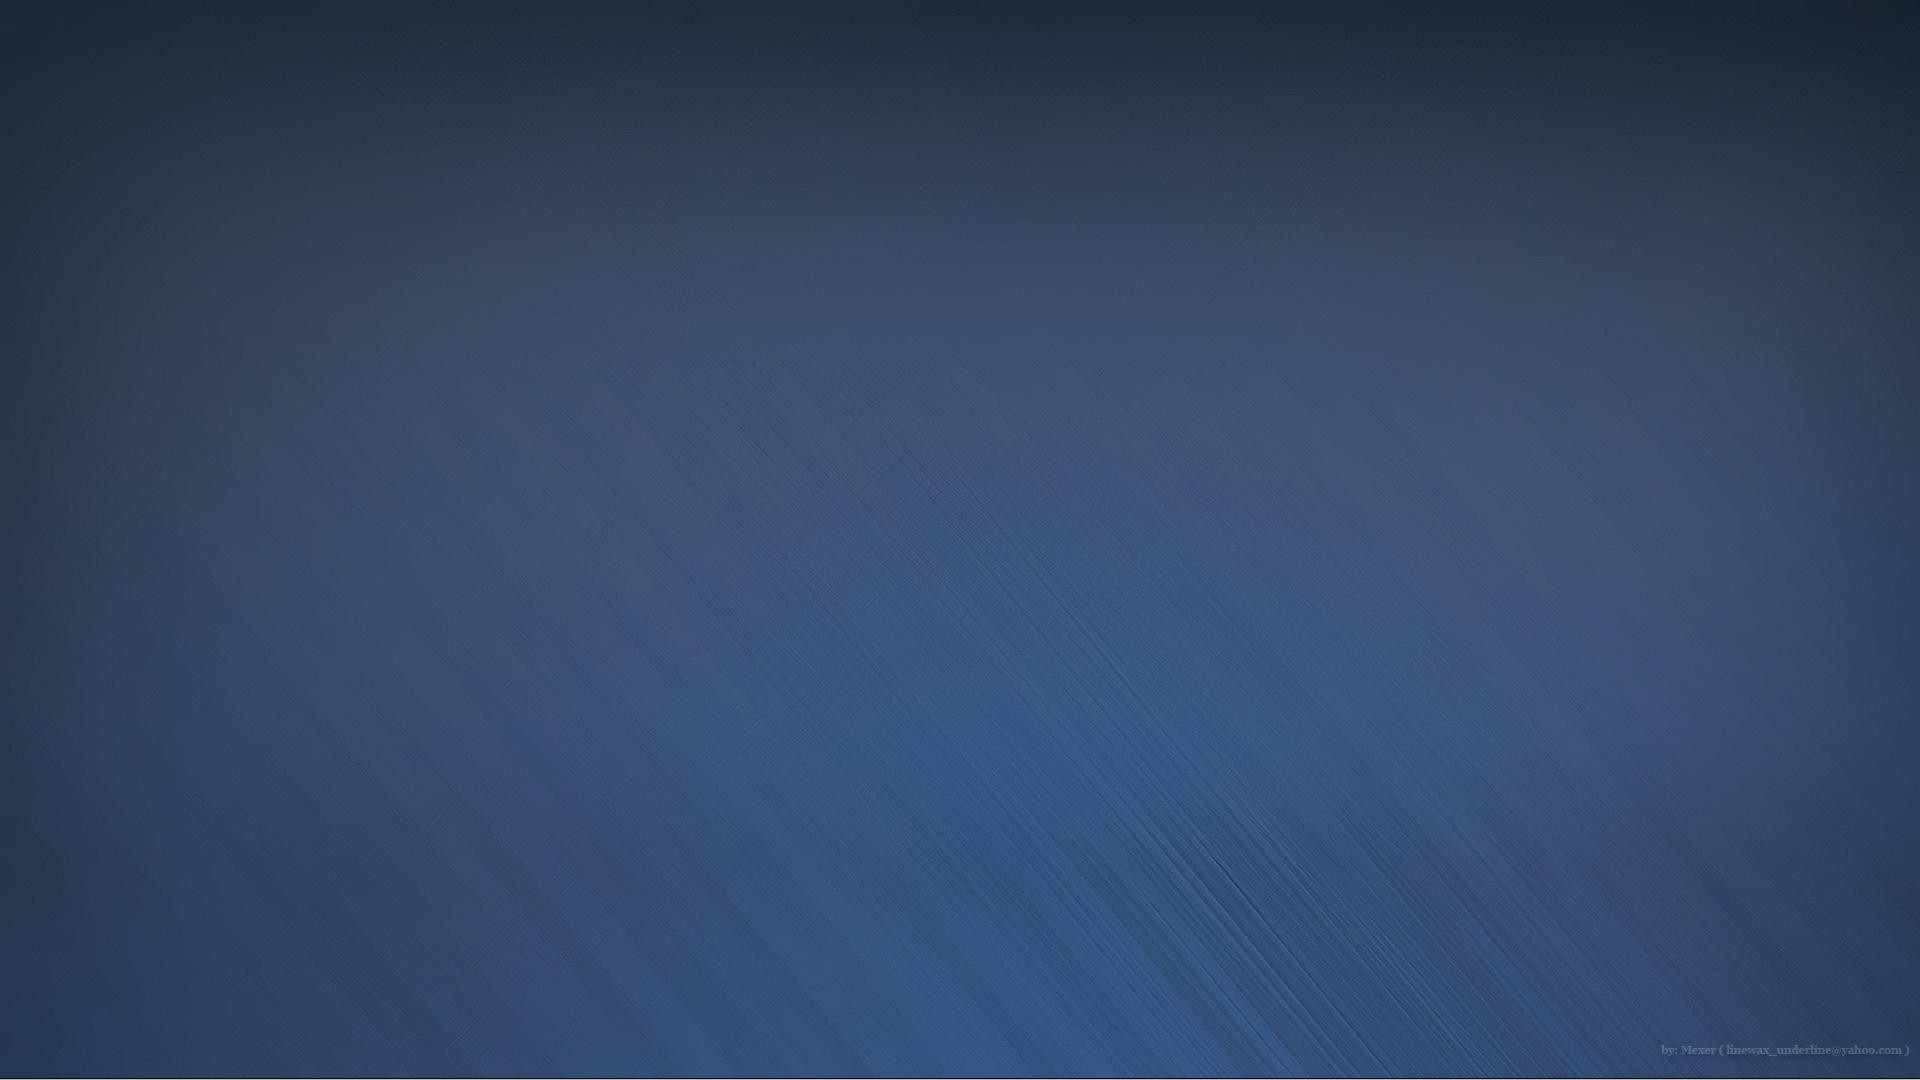 Basic Grey Desktop Wallpaper 61 images 1920x1080